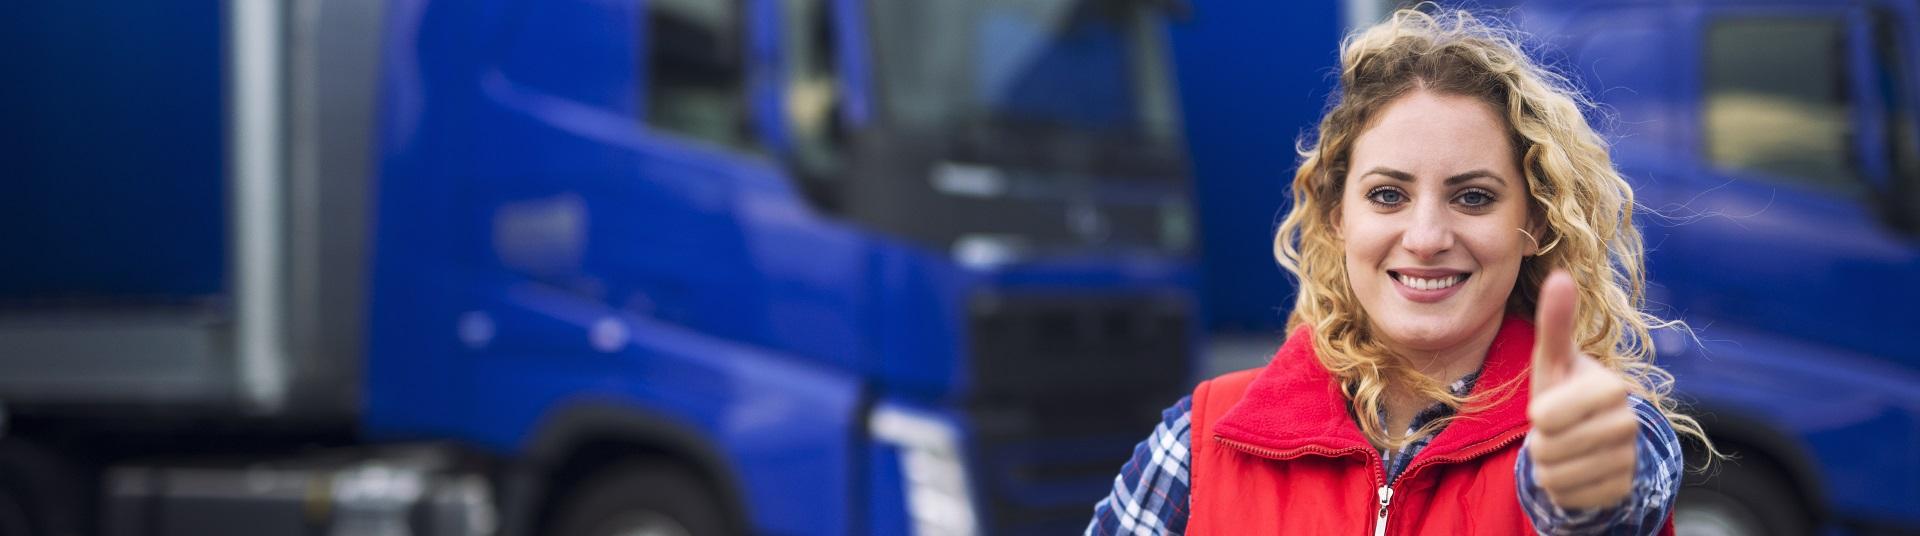 accompagnement gestion dossier remboursement ticpe transporteur sdei